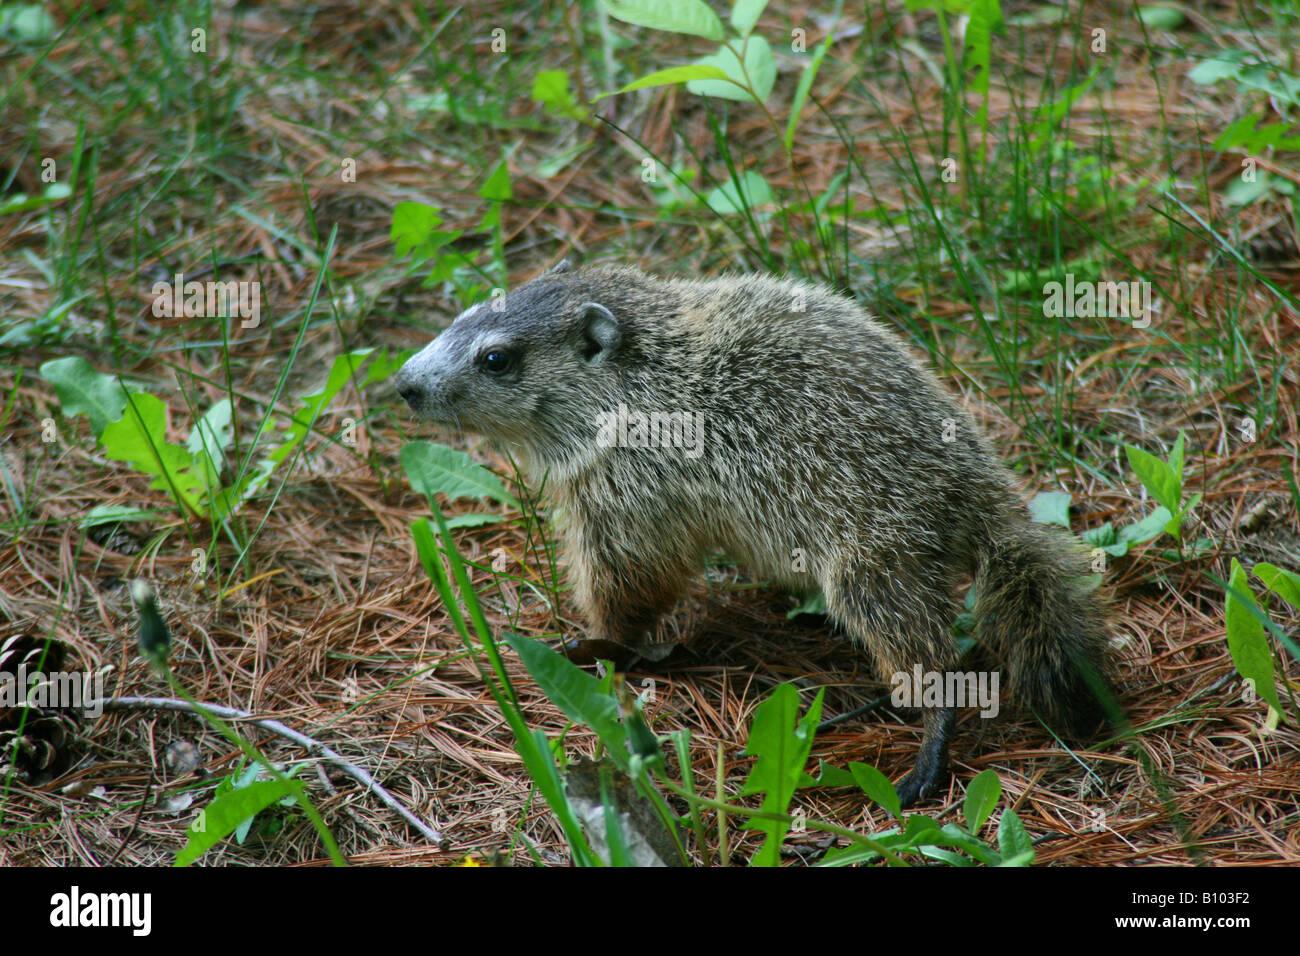 Baby Groundhog or Woodchuck Marmota monax Eastern North America - Stock Image